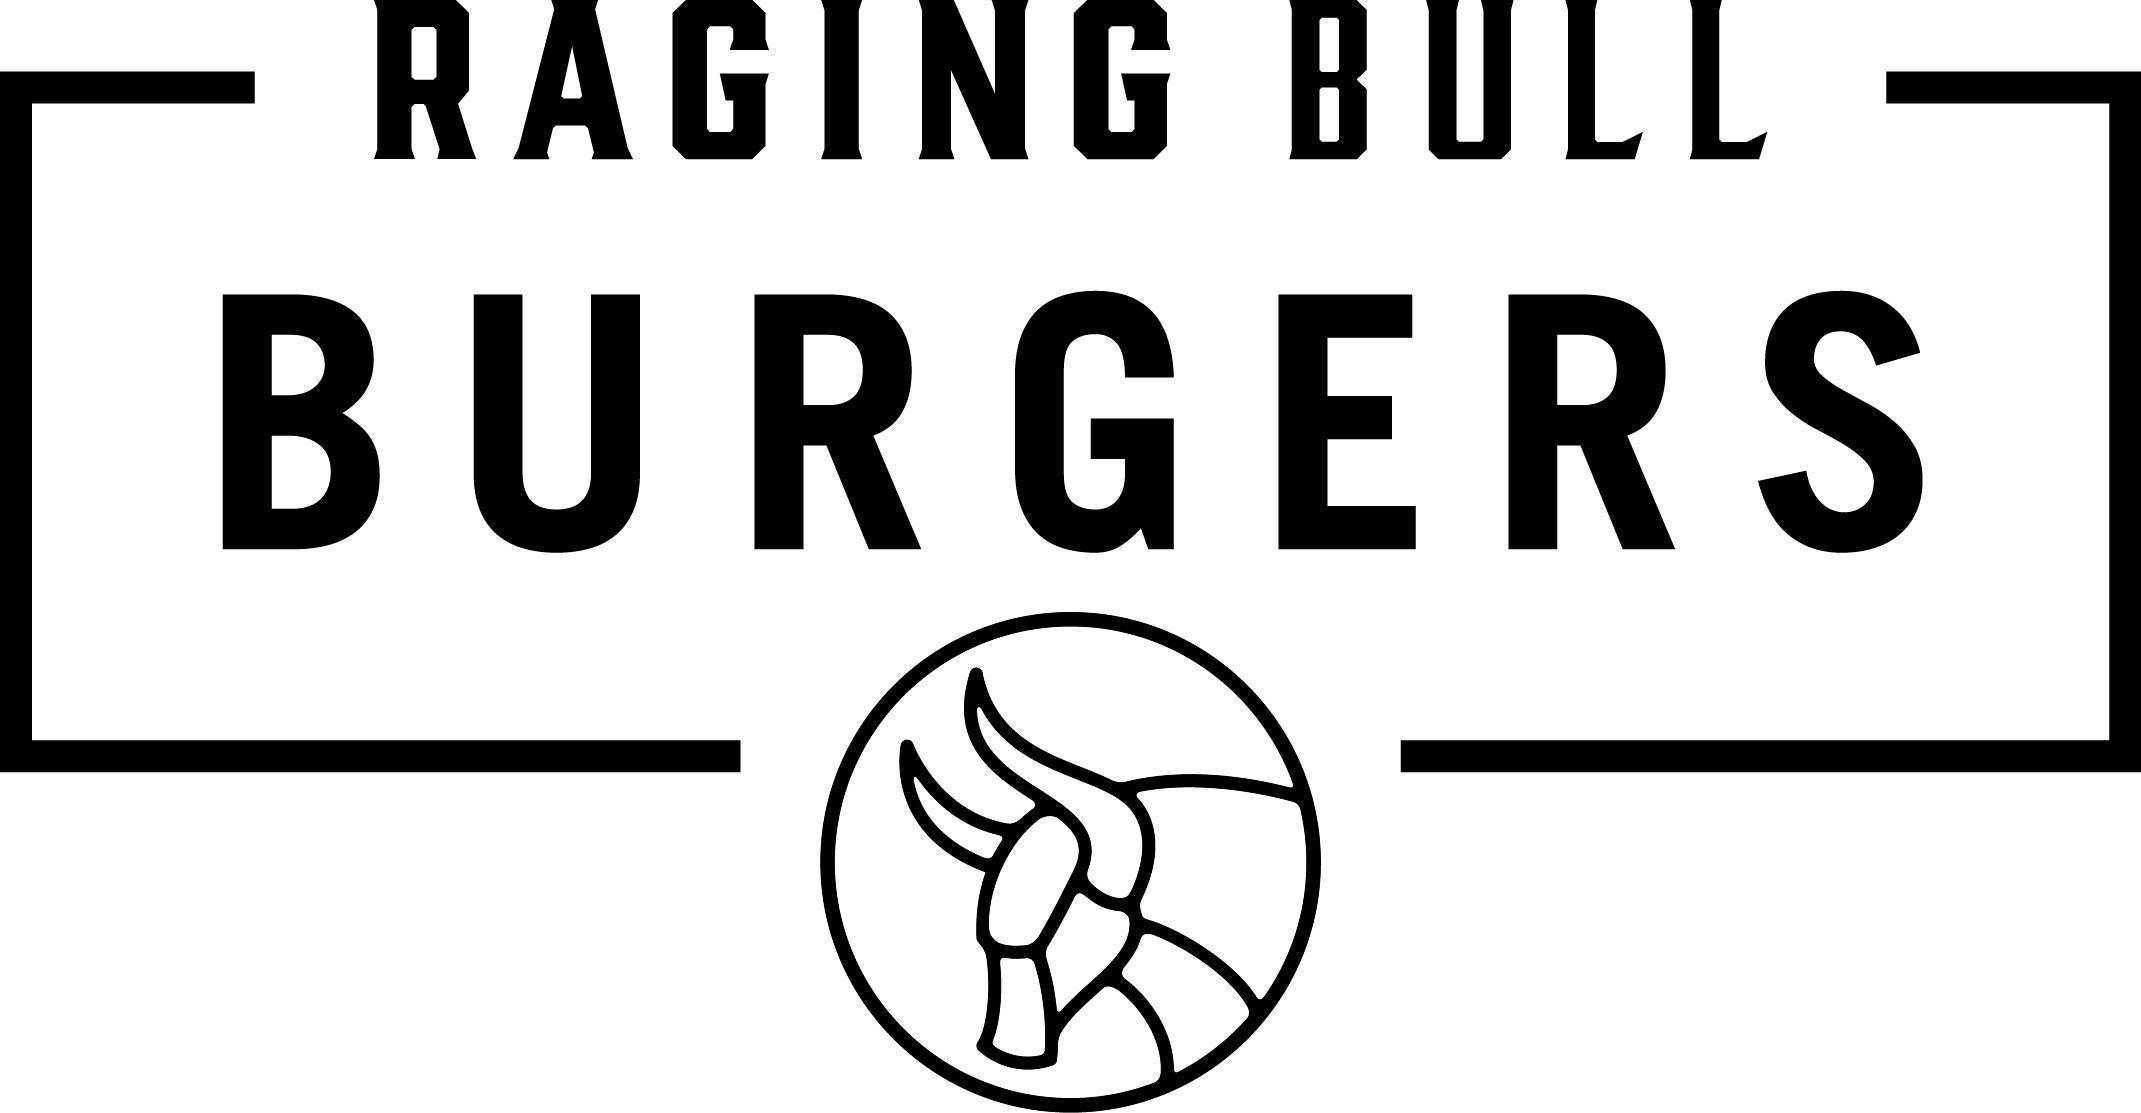 Raging Bull Burgers